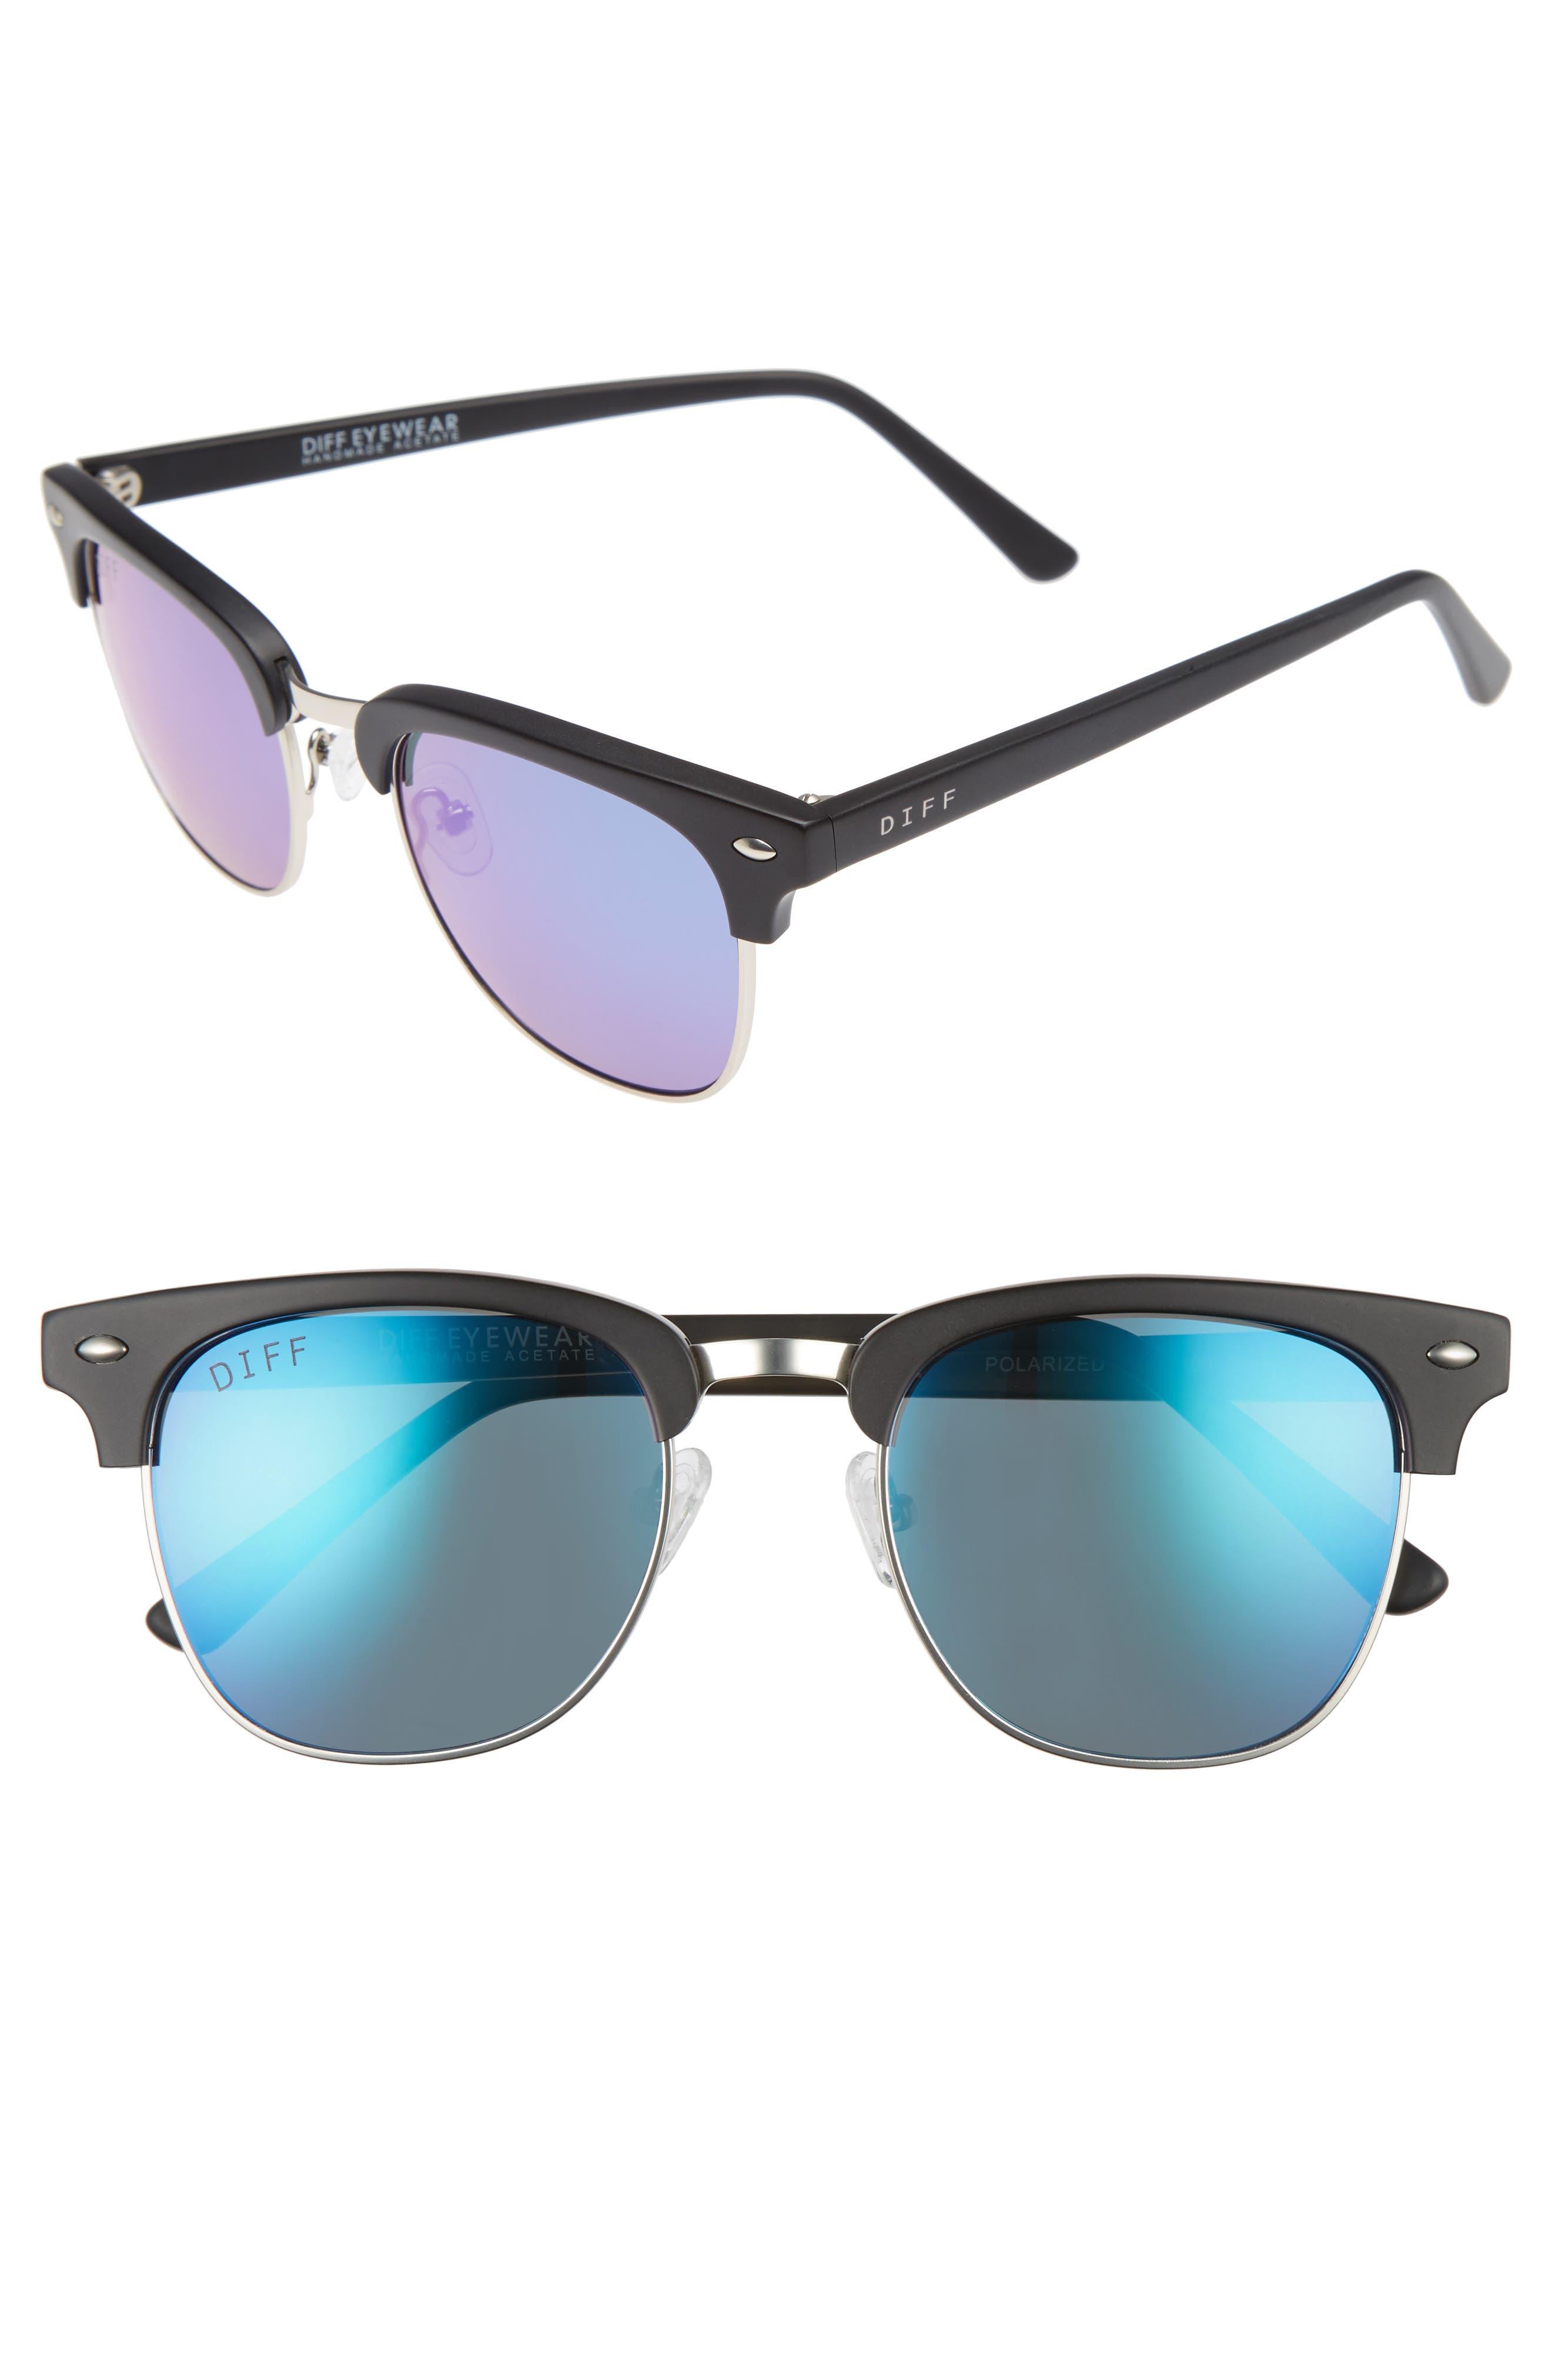 Barry 51mm Polarized Retro Sunglasses,                             Main thumbnail 1, color,